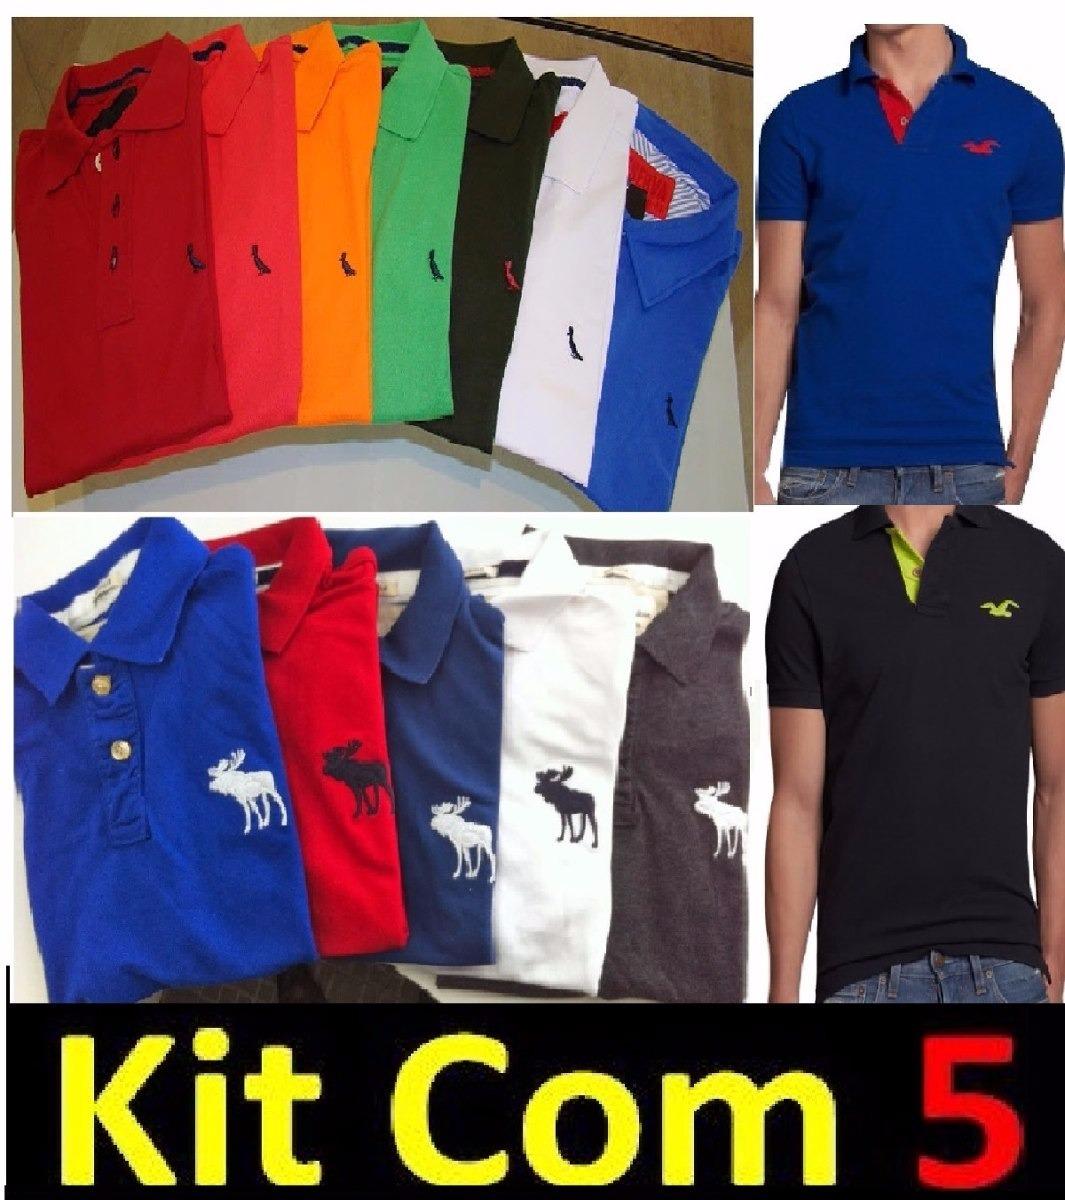 Kit 5 Camisa Camiseta Masculina Gola Polo Marcas Jovem - R  165 2604ee7e5bf8f